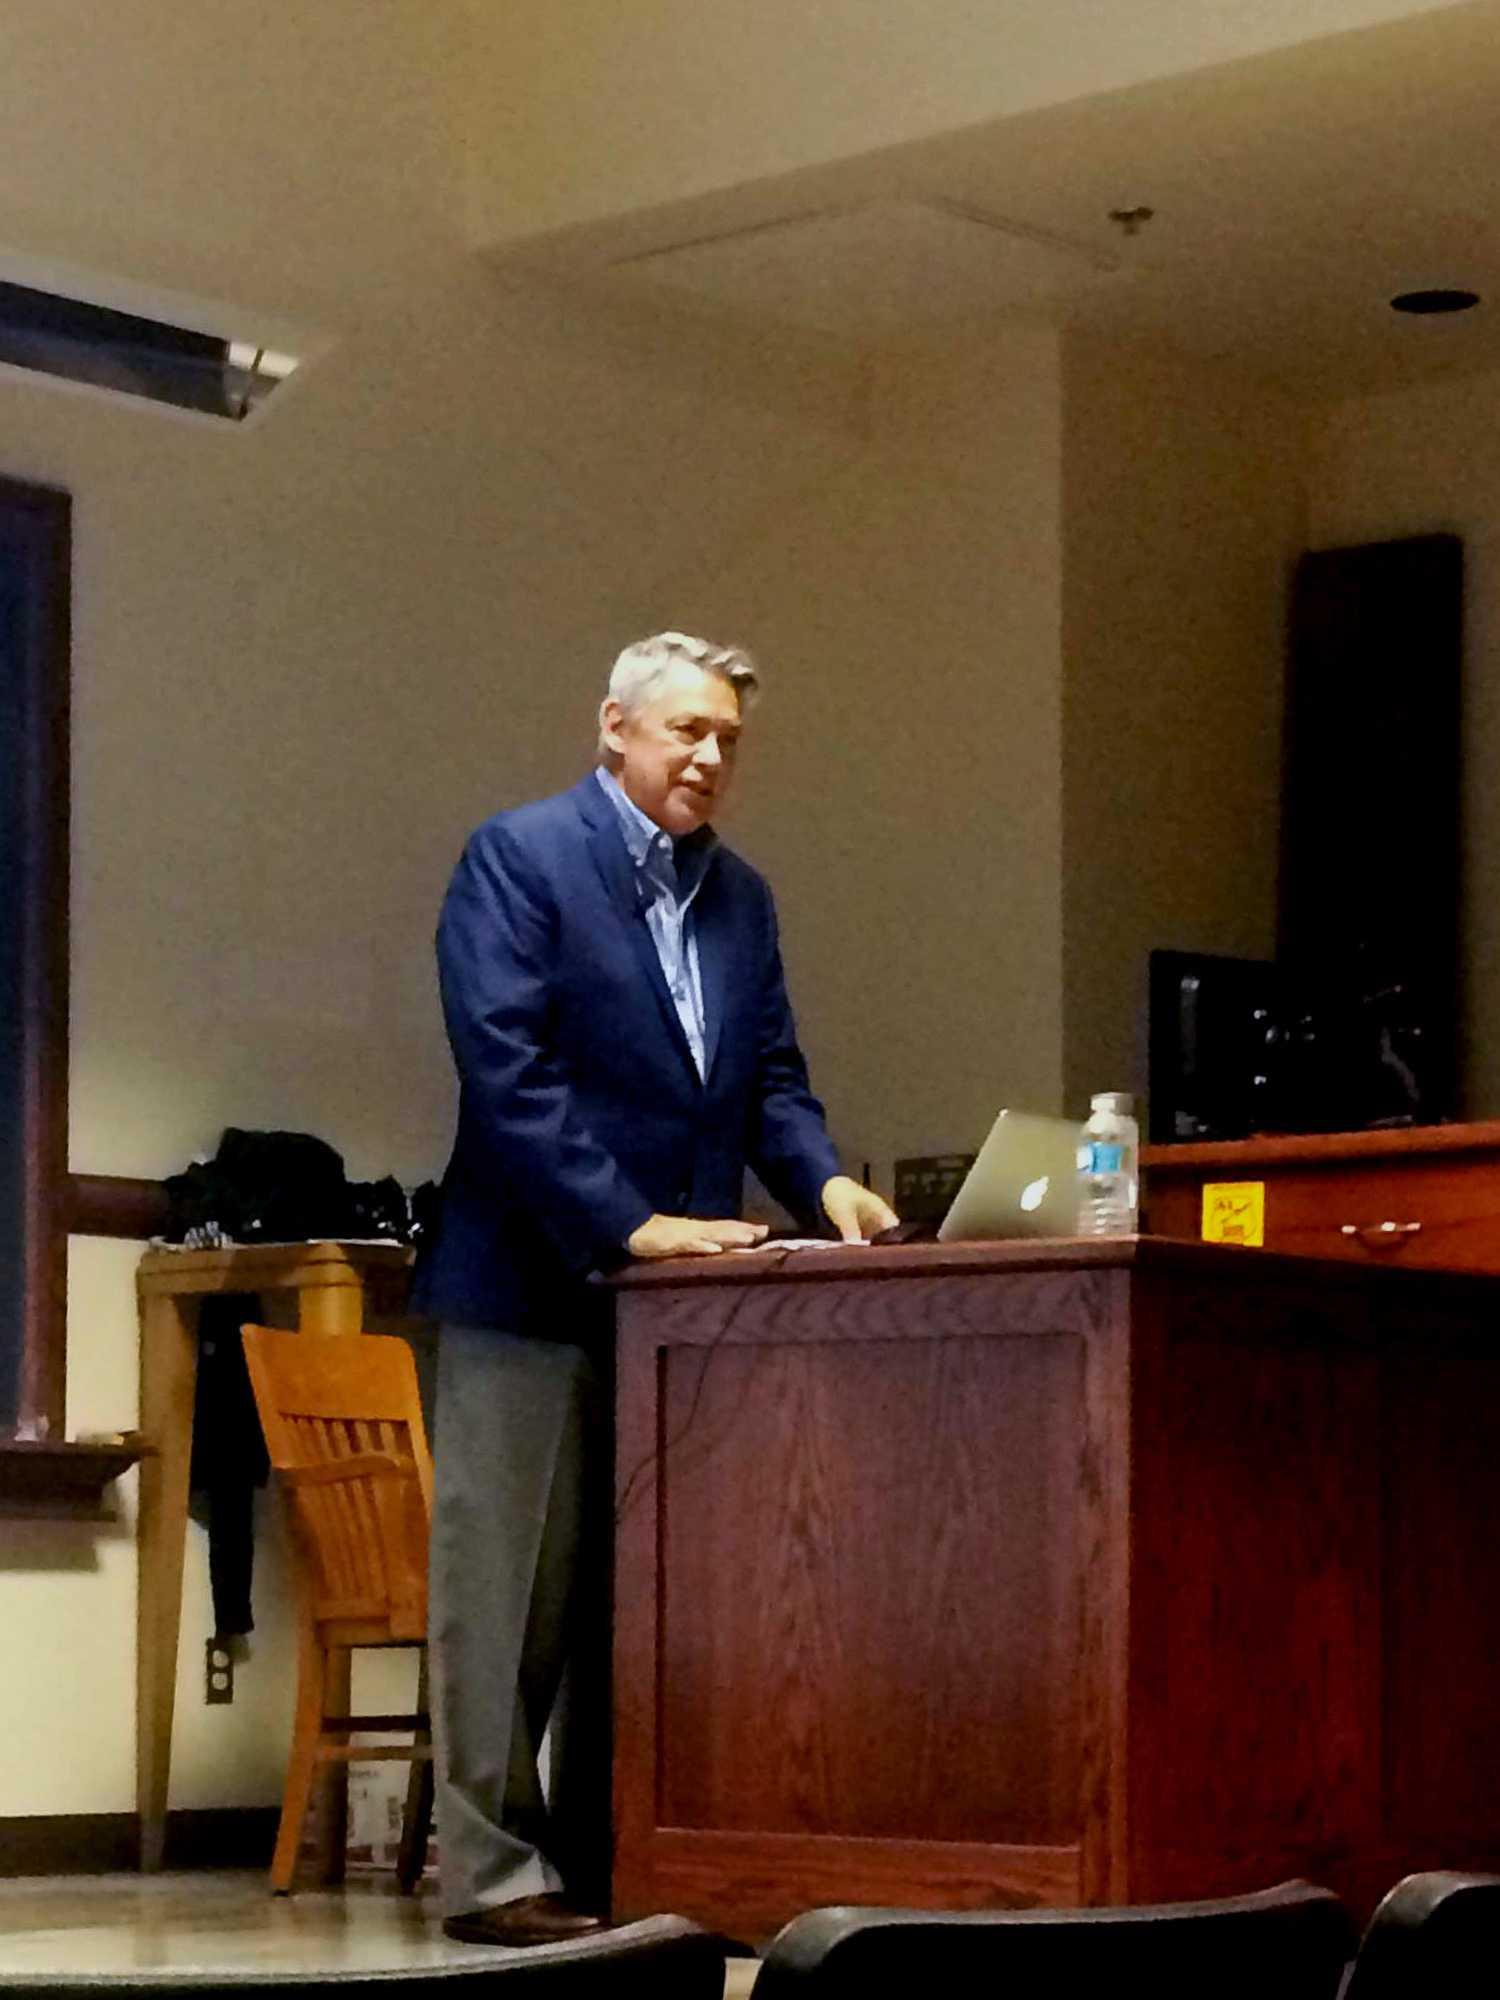 Juan Gonzales speaks at the University of Illinois on Monday, October 24, 2016.